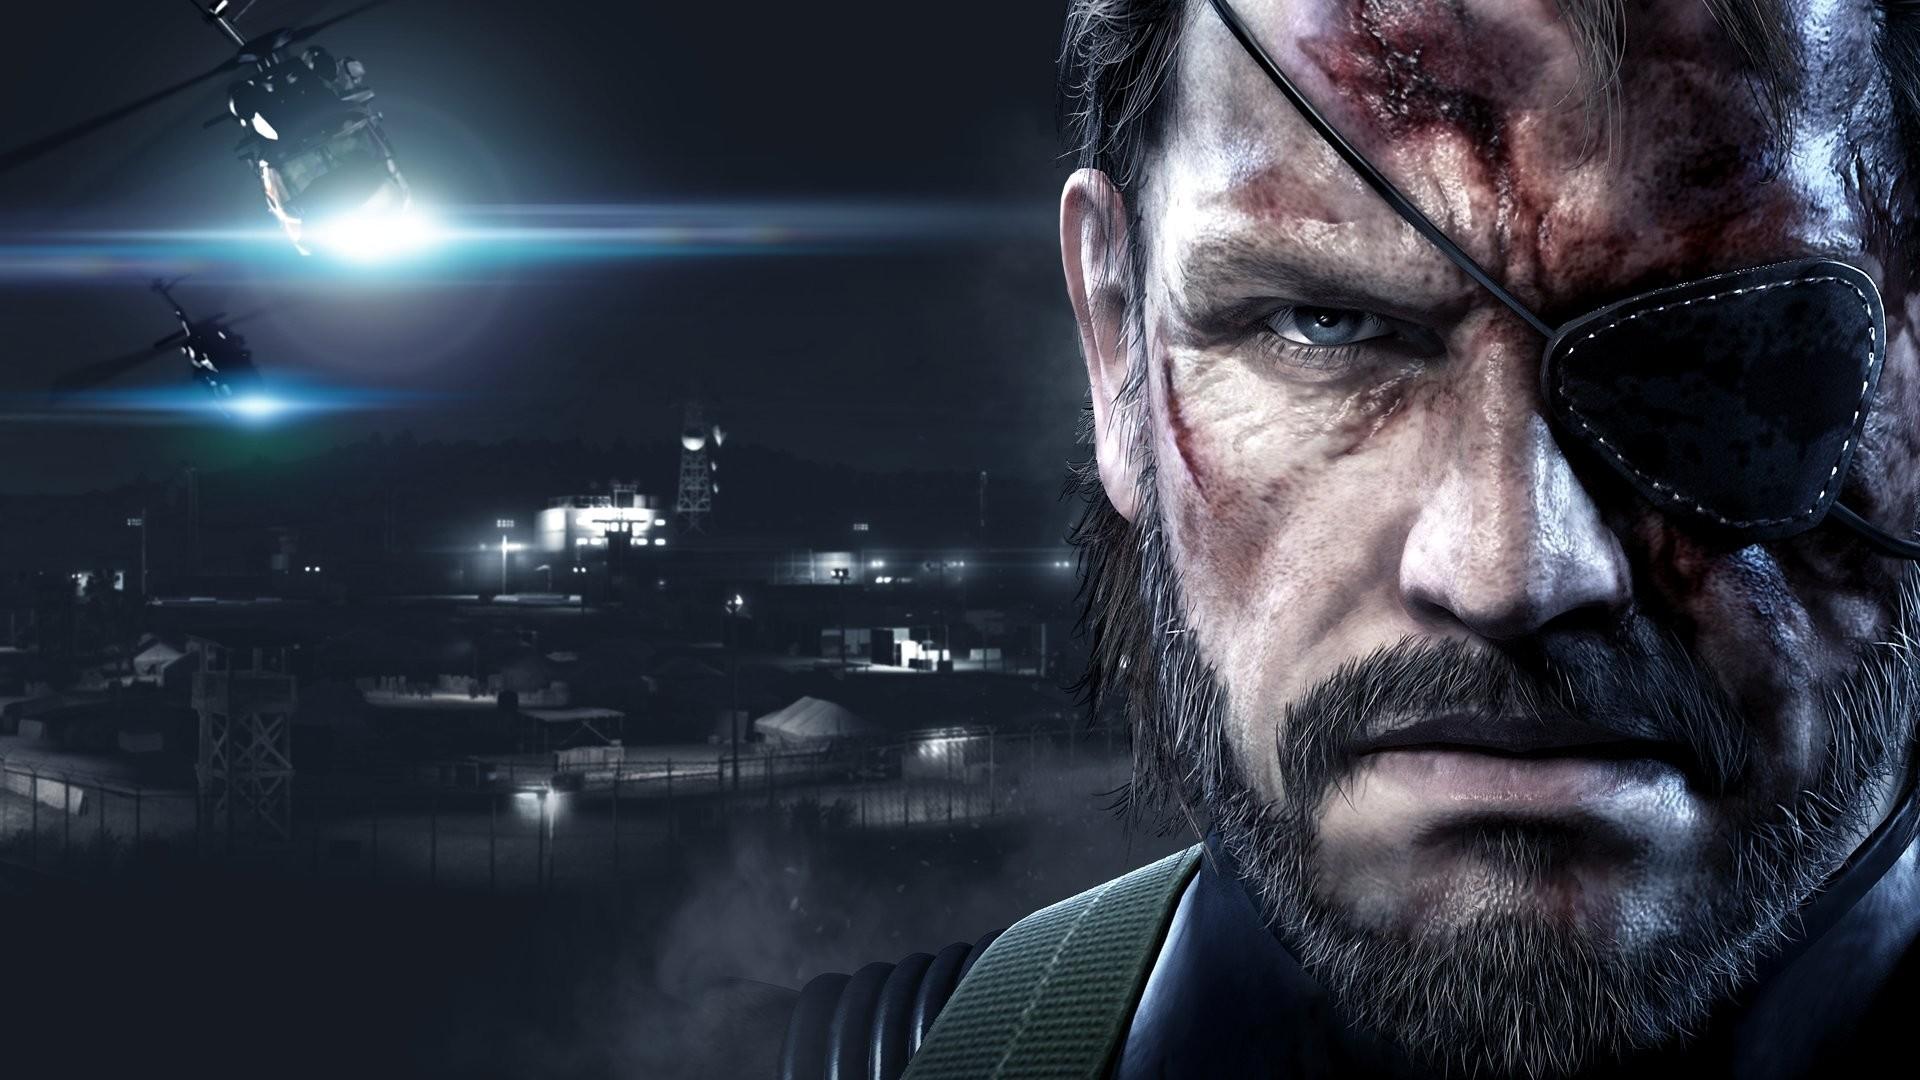 Wallpaper HD Metal Gear Solid V Ground Zeroes #MGSVGroundZeroes #MGS  #MetalGearSolid #GroundZeroes